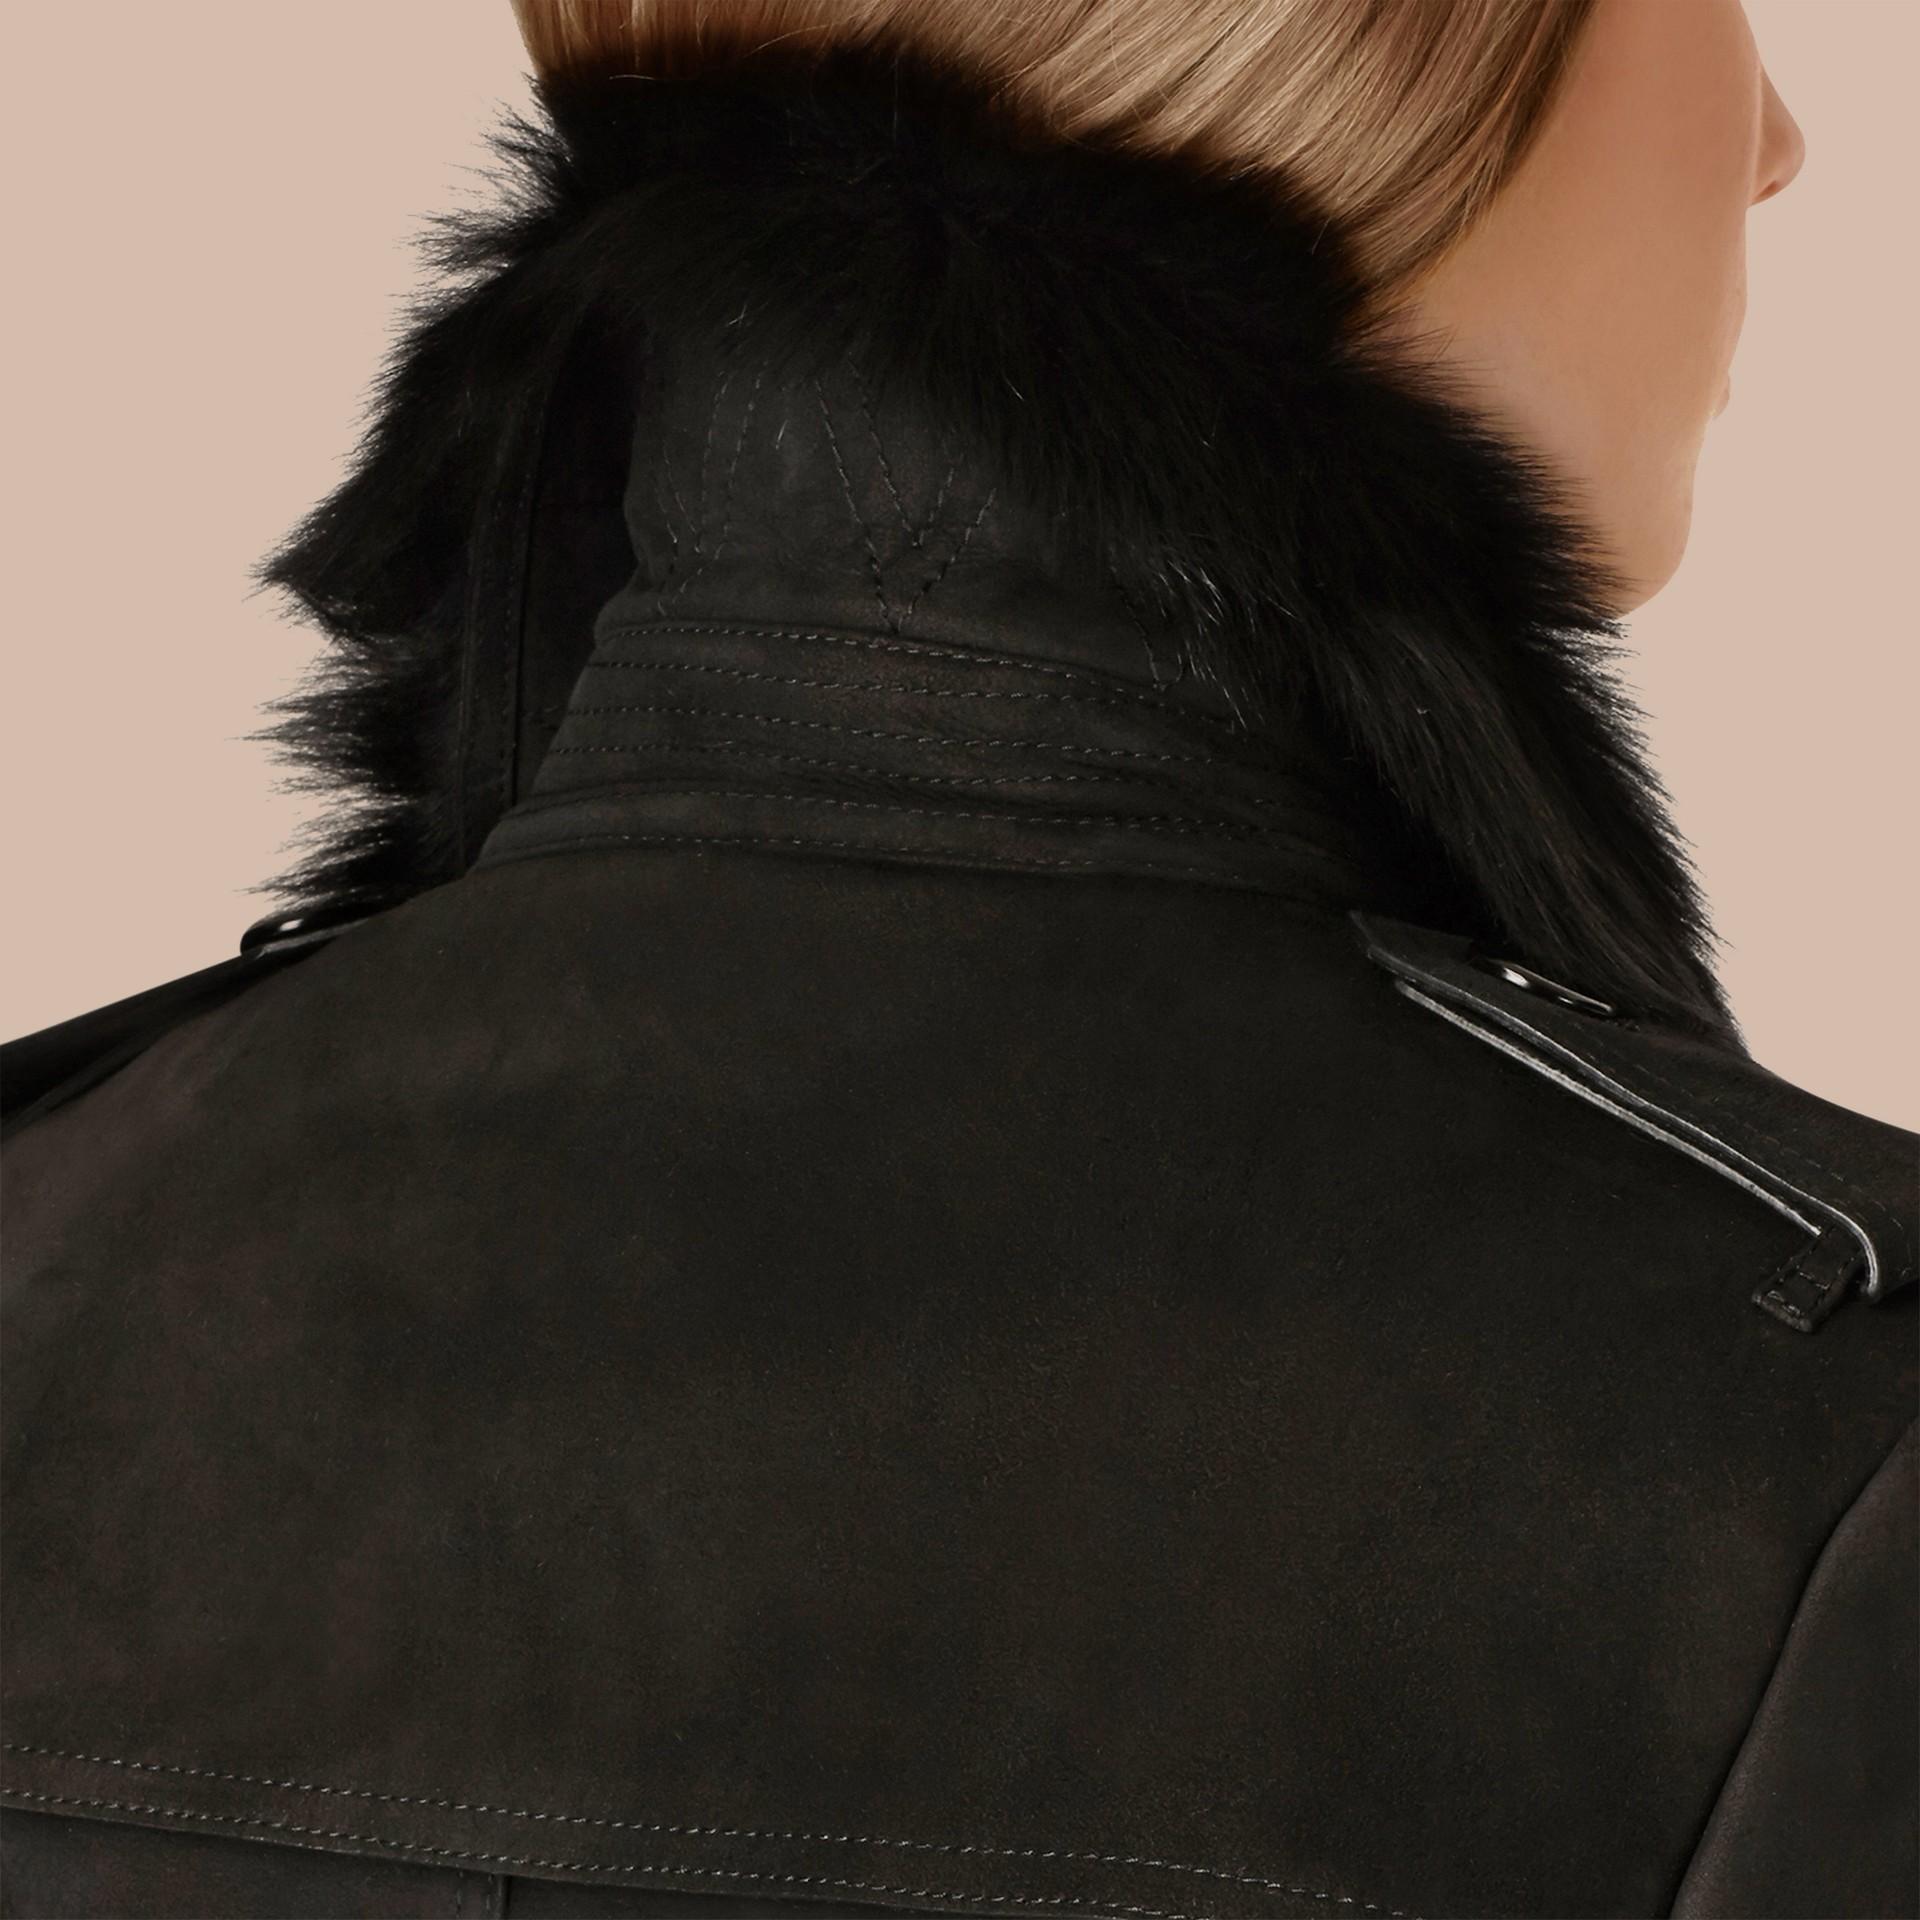 Noir Trench-coat en shearling Noir - photo de la galerie 5